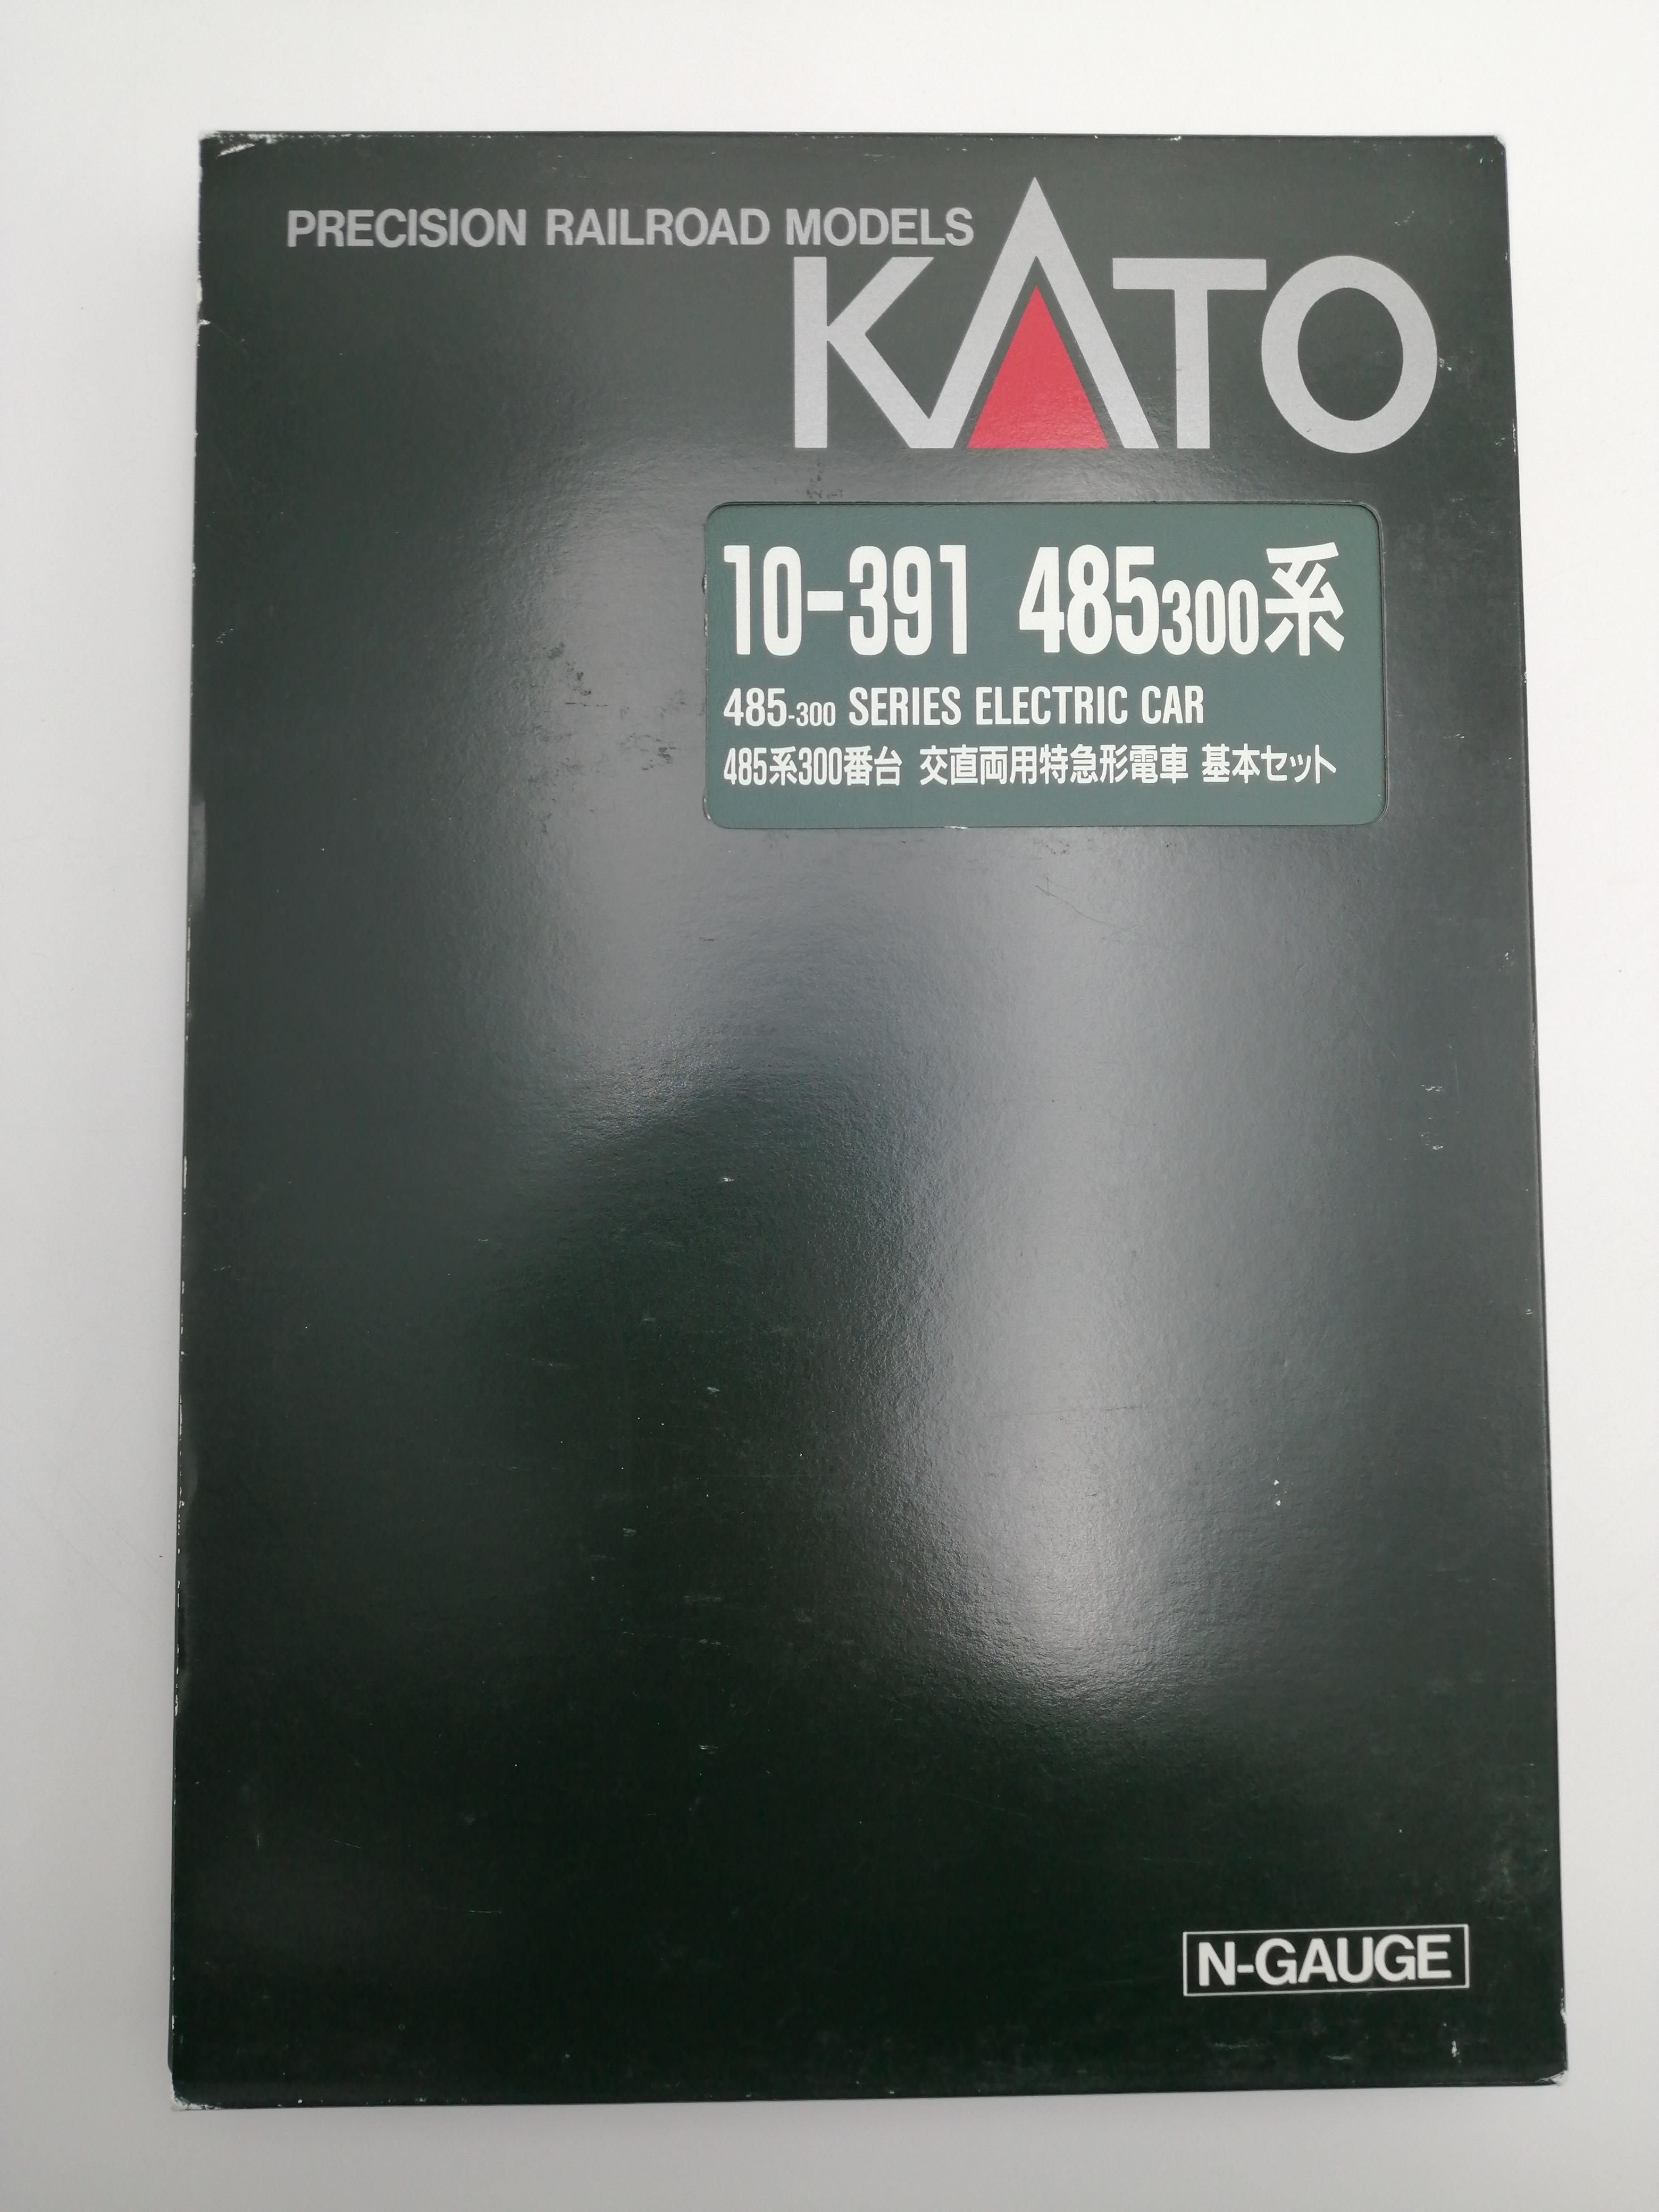 485系300番台 交直両用特急形電車 基本セット|KATO